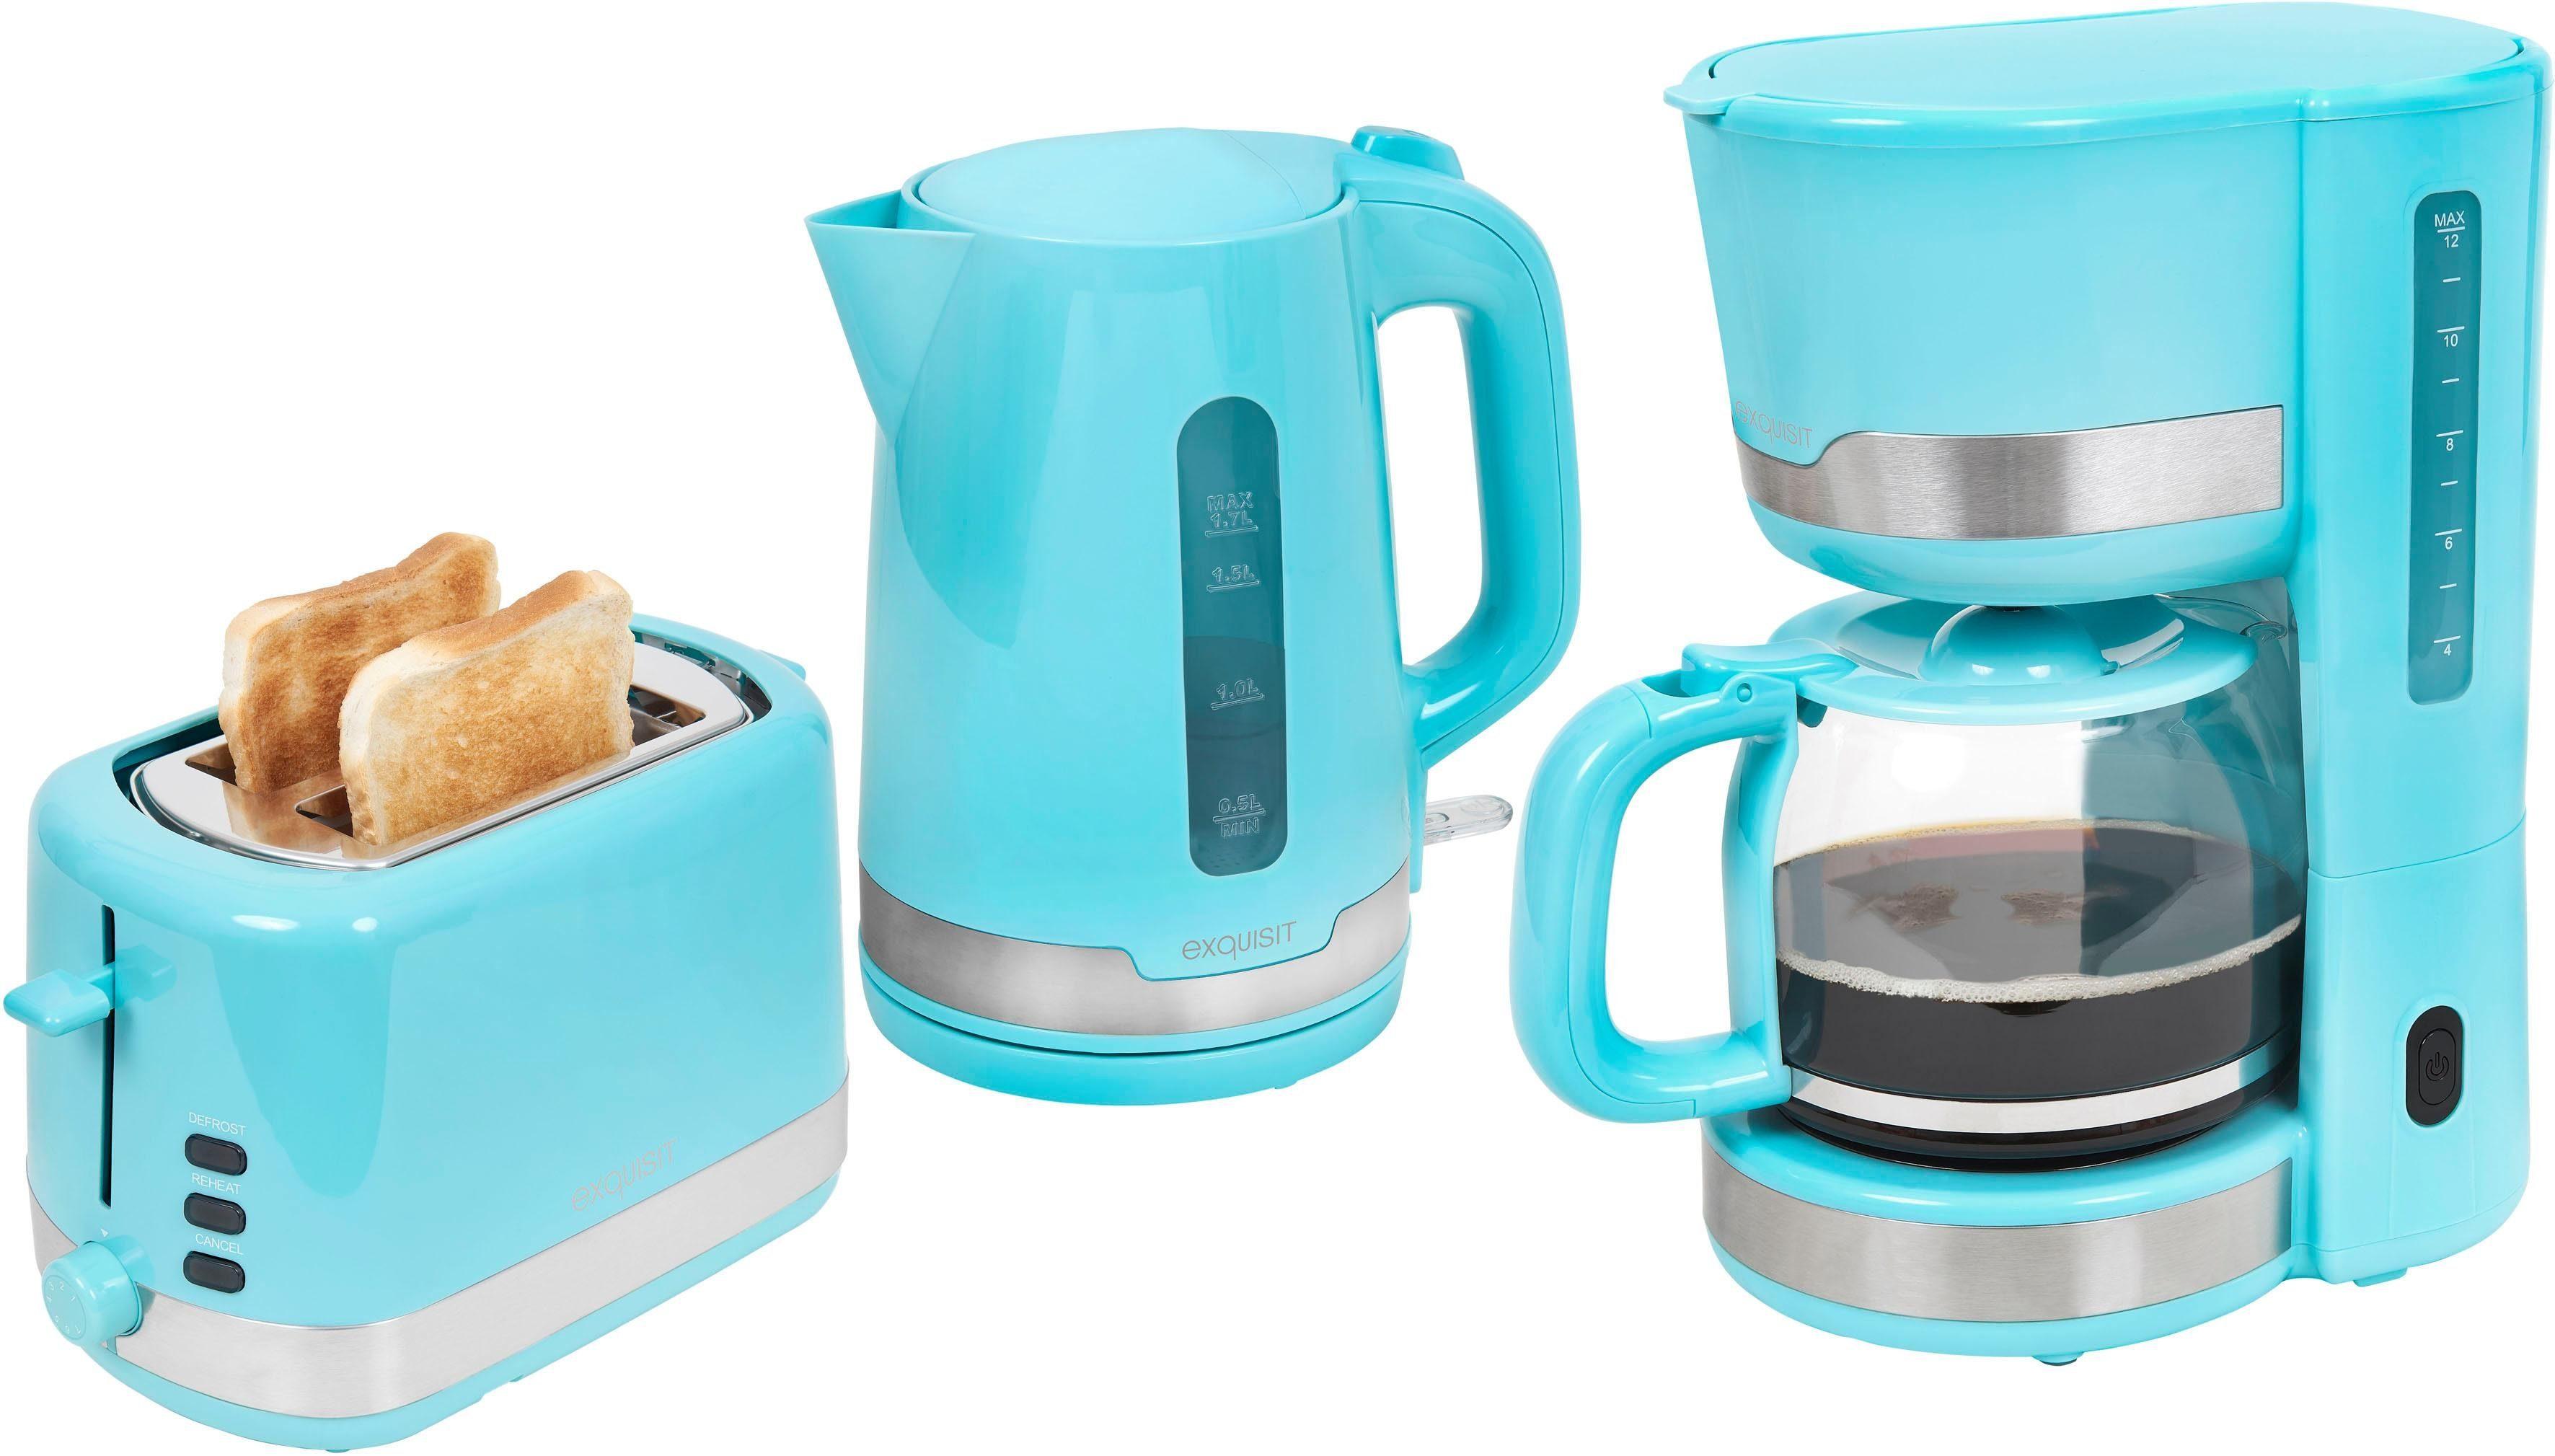 1,7 Liter blau//Edelstahl Exquisit Wasserkocher WK 7101 pbl 2200 Watt